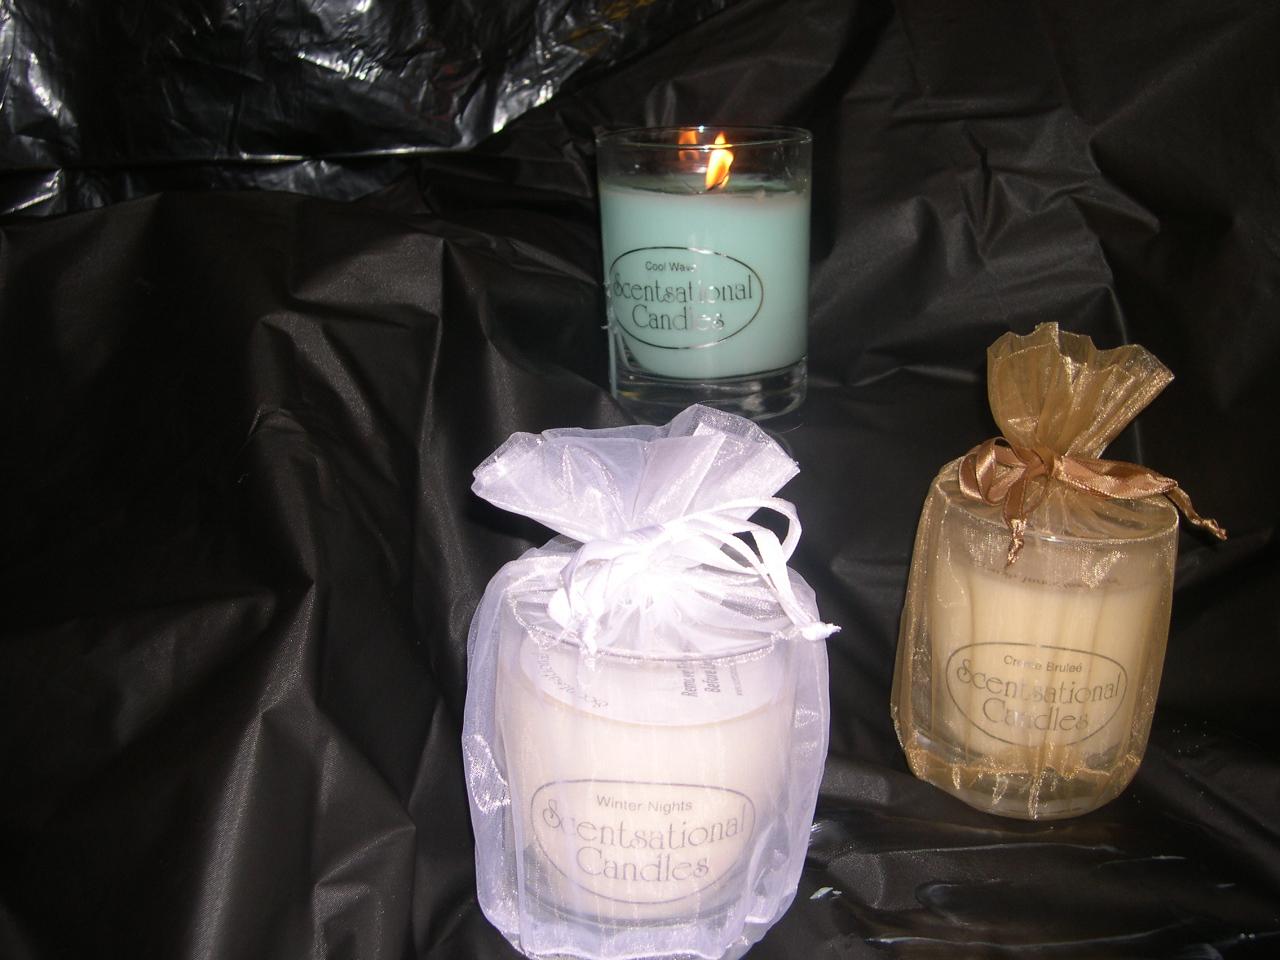 Scentsational Candles